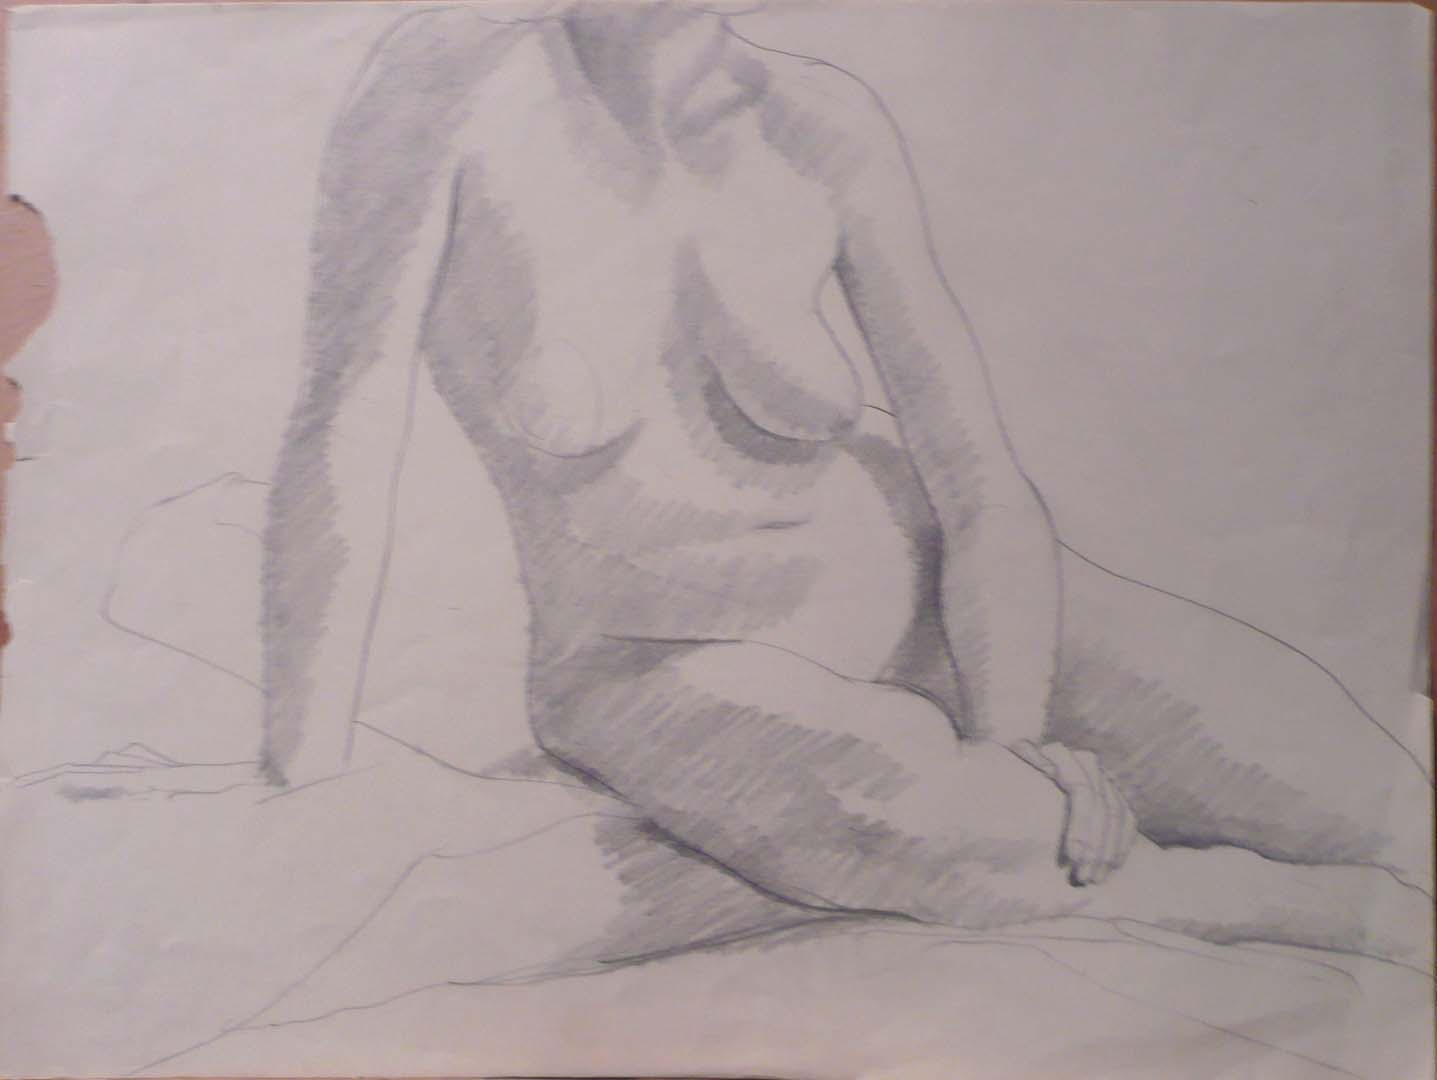 Seated Nude Pencil 16.25 x 21.75